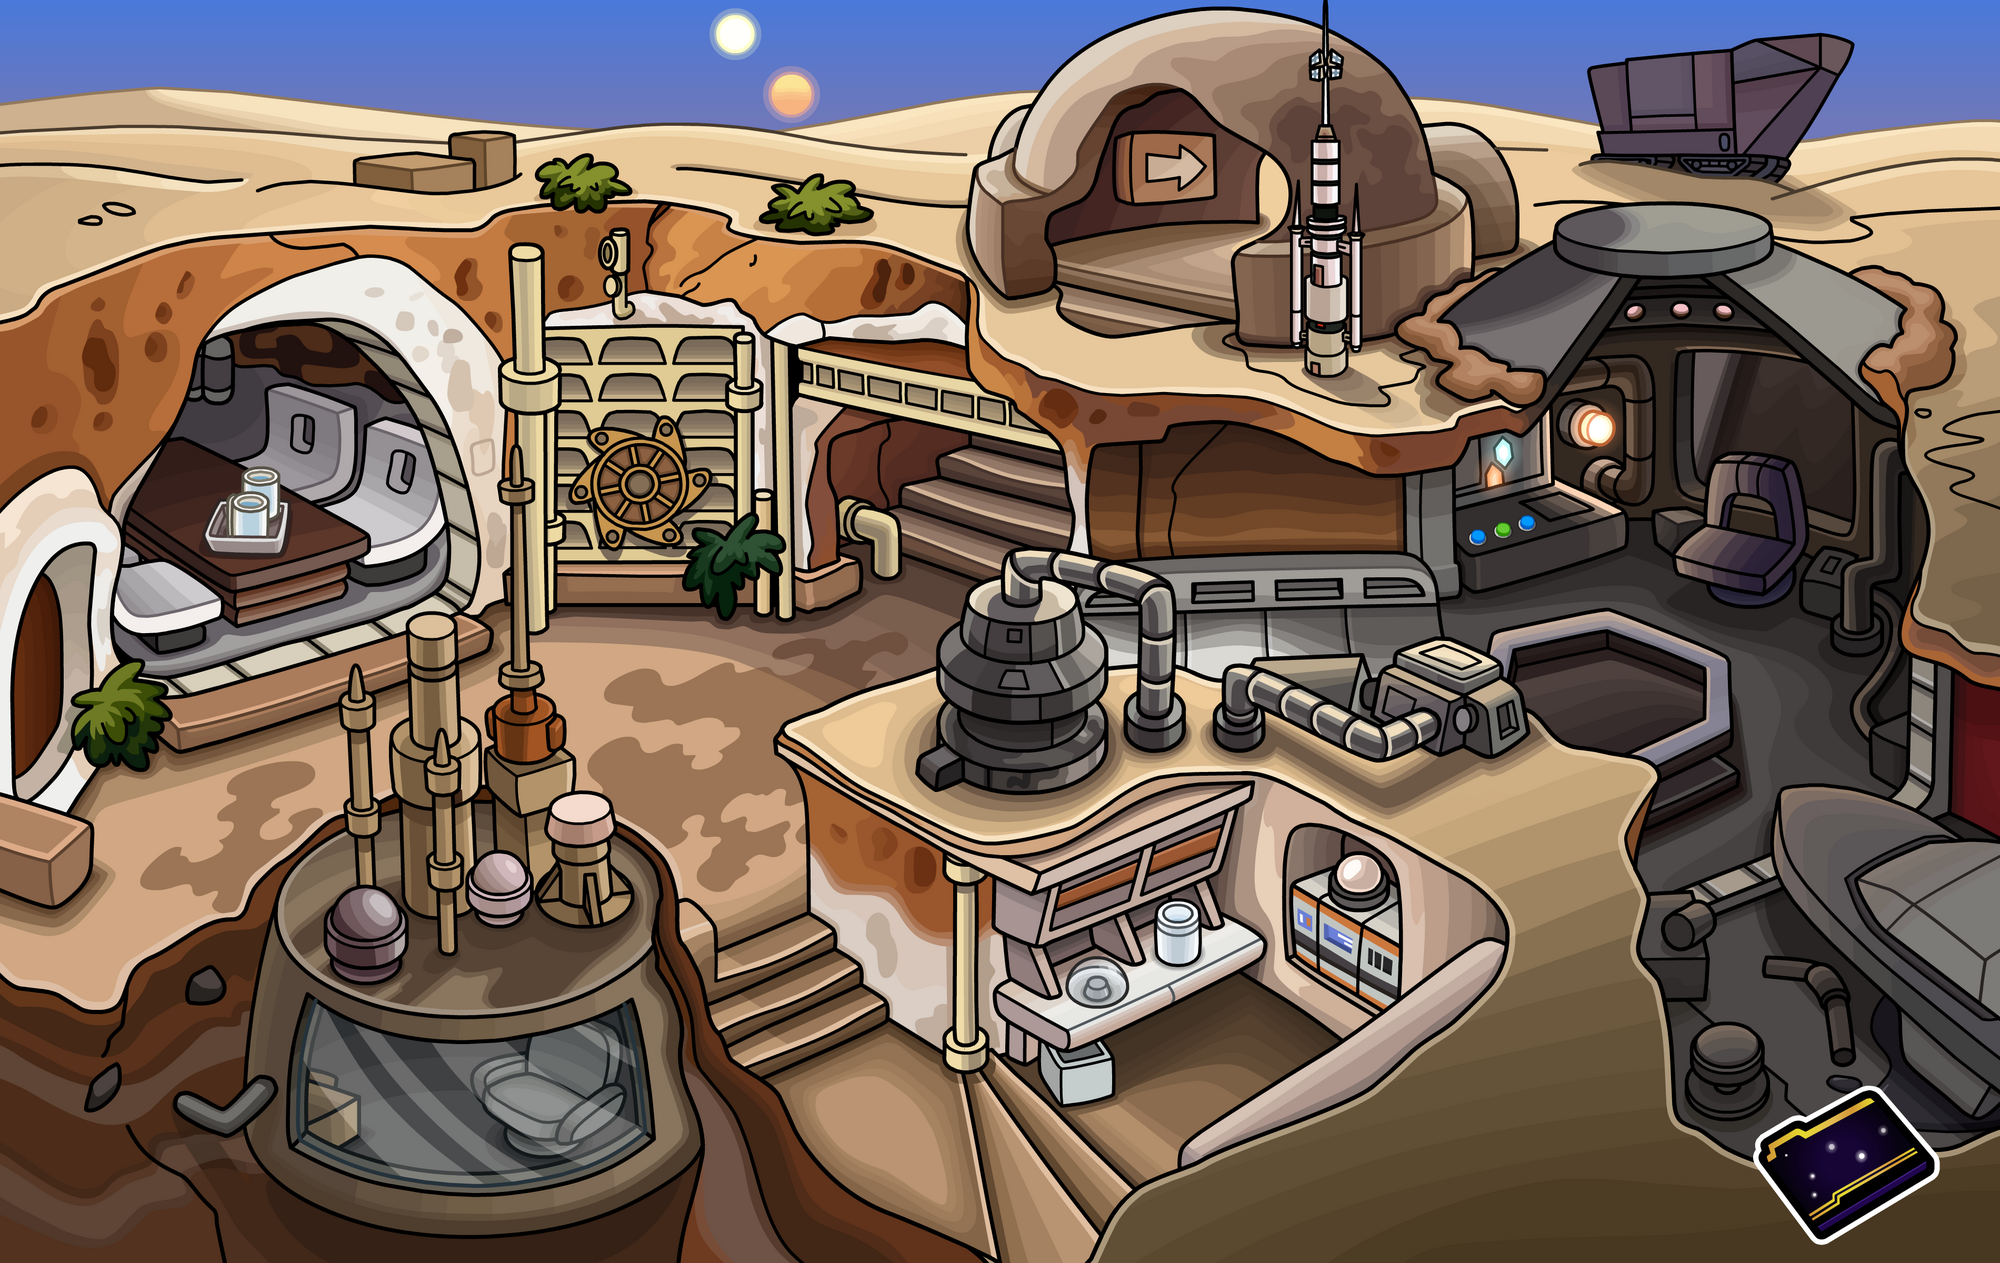 Star Wars Floor Plans Lars Homestead Club Penguin Wiki Fandom Powered By Wikia